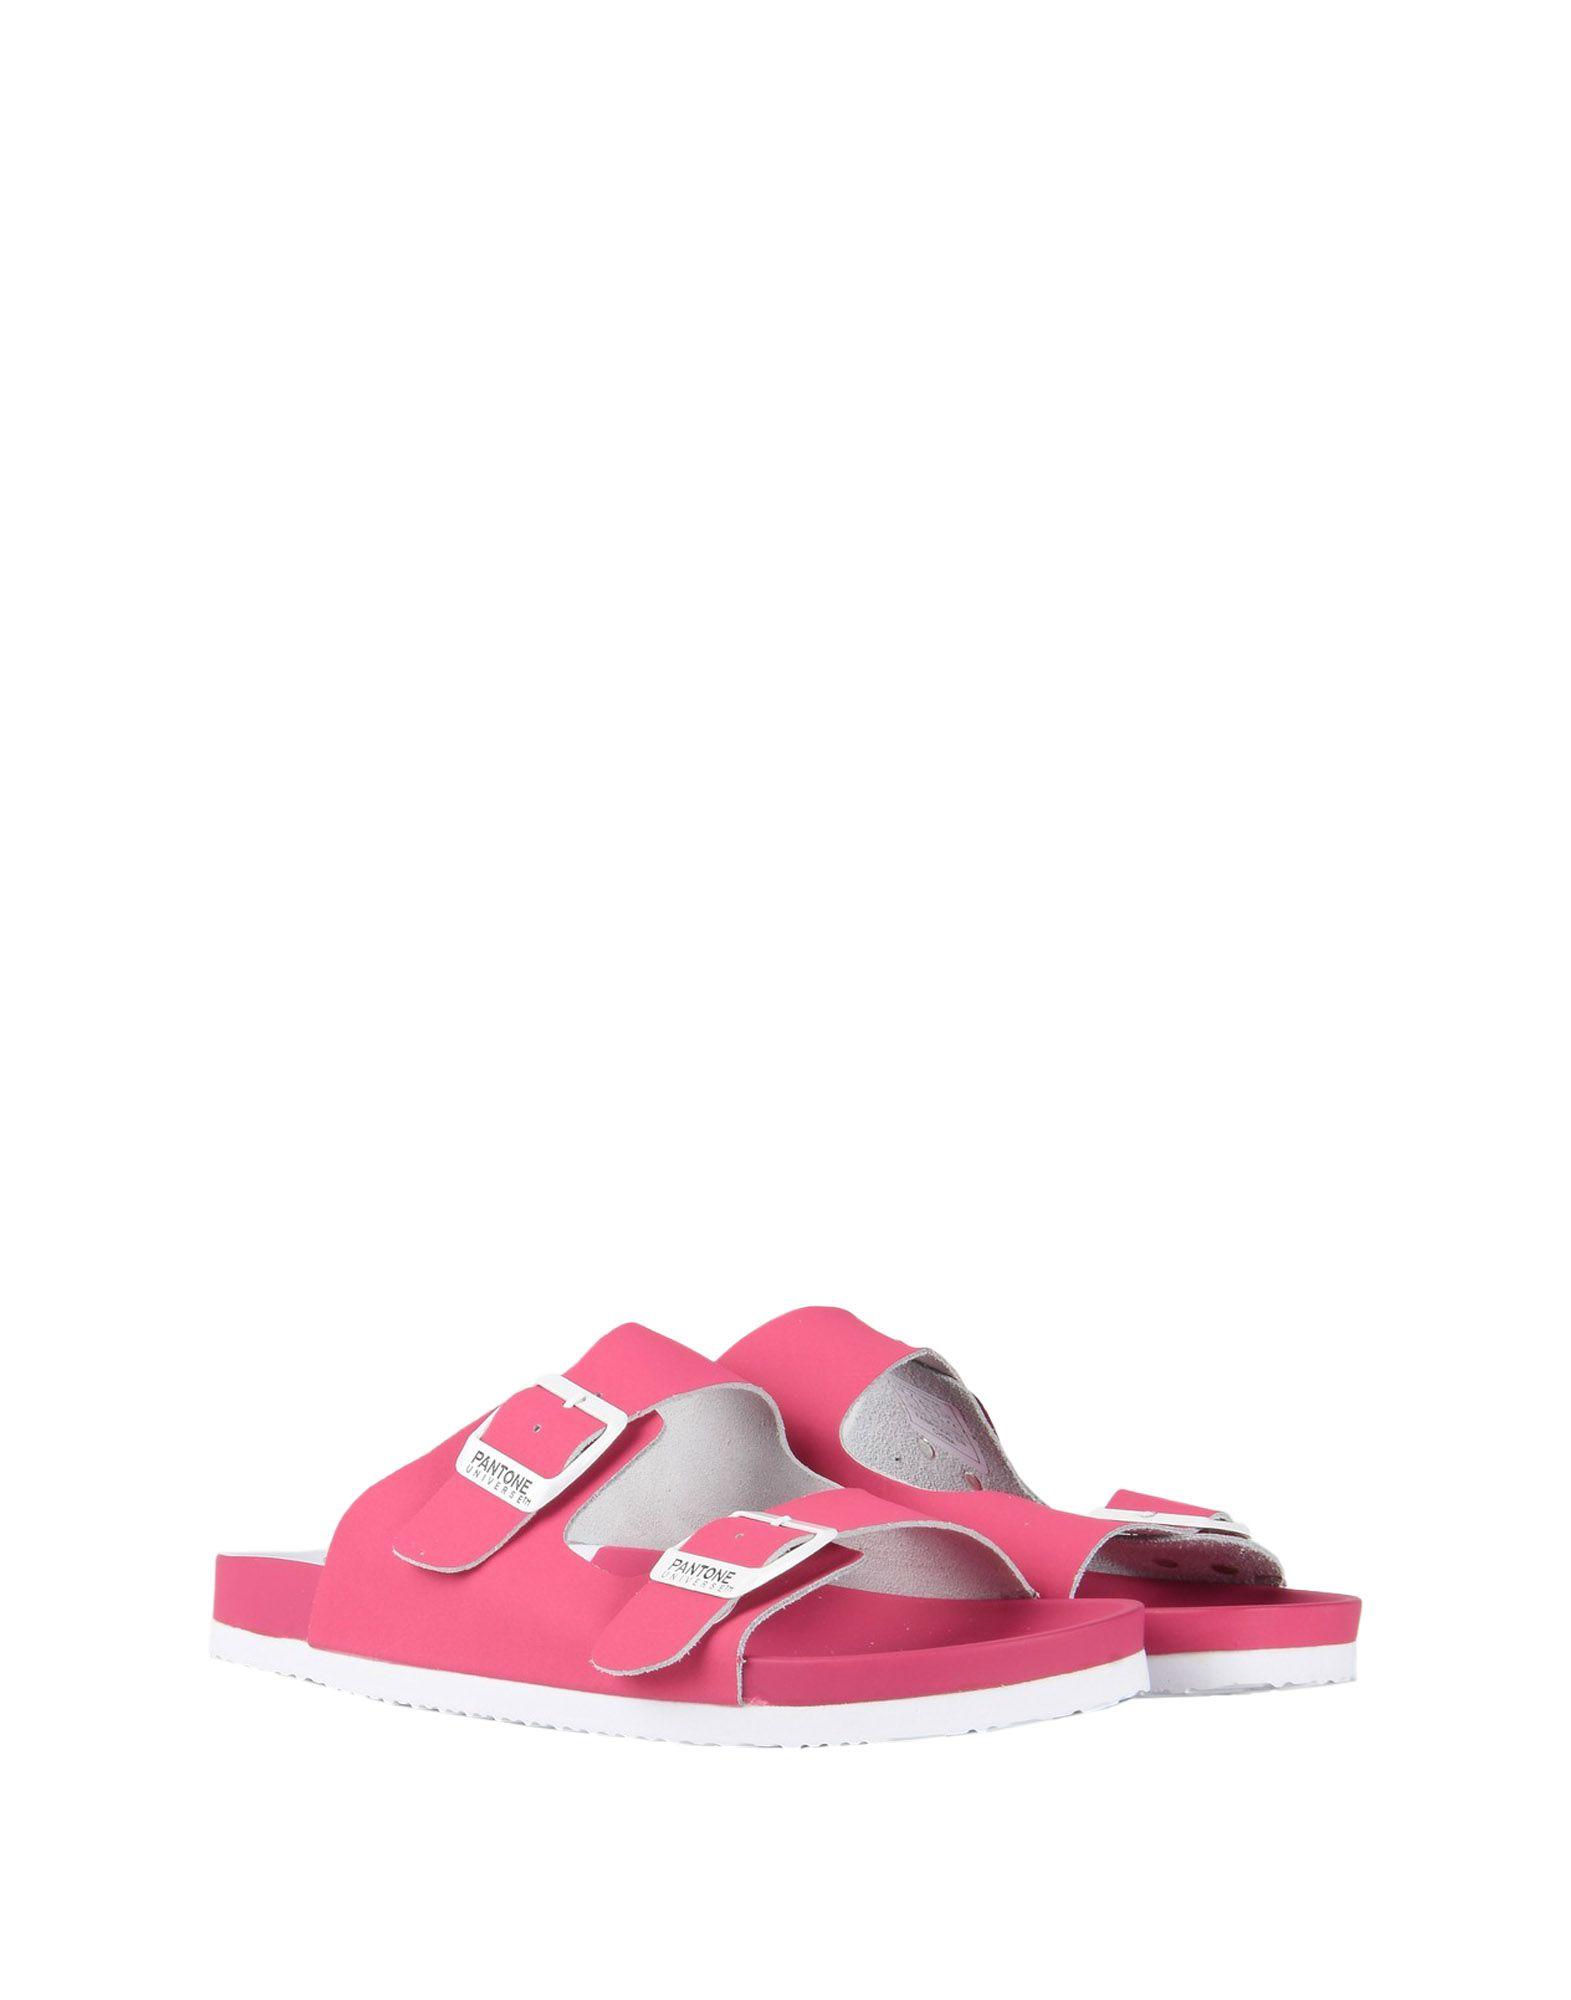 Sandales Pantone Universe Footwear Formentera Leather - Femme - Sandales Pantone Universe Footwear sur